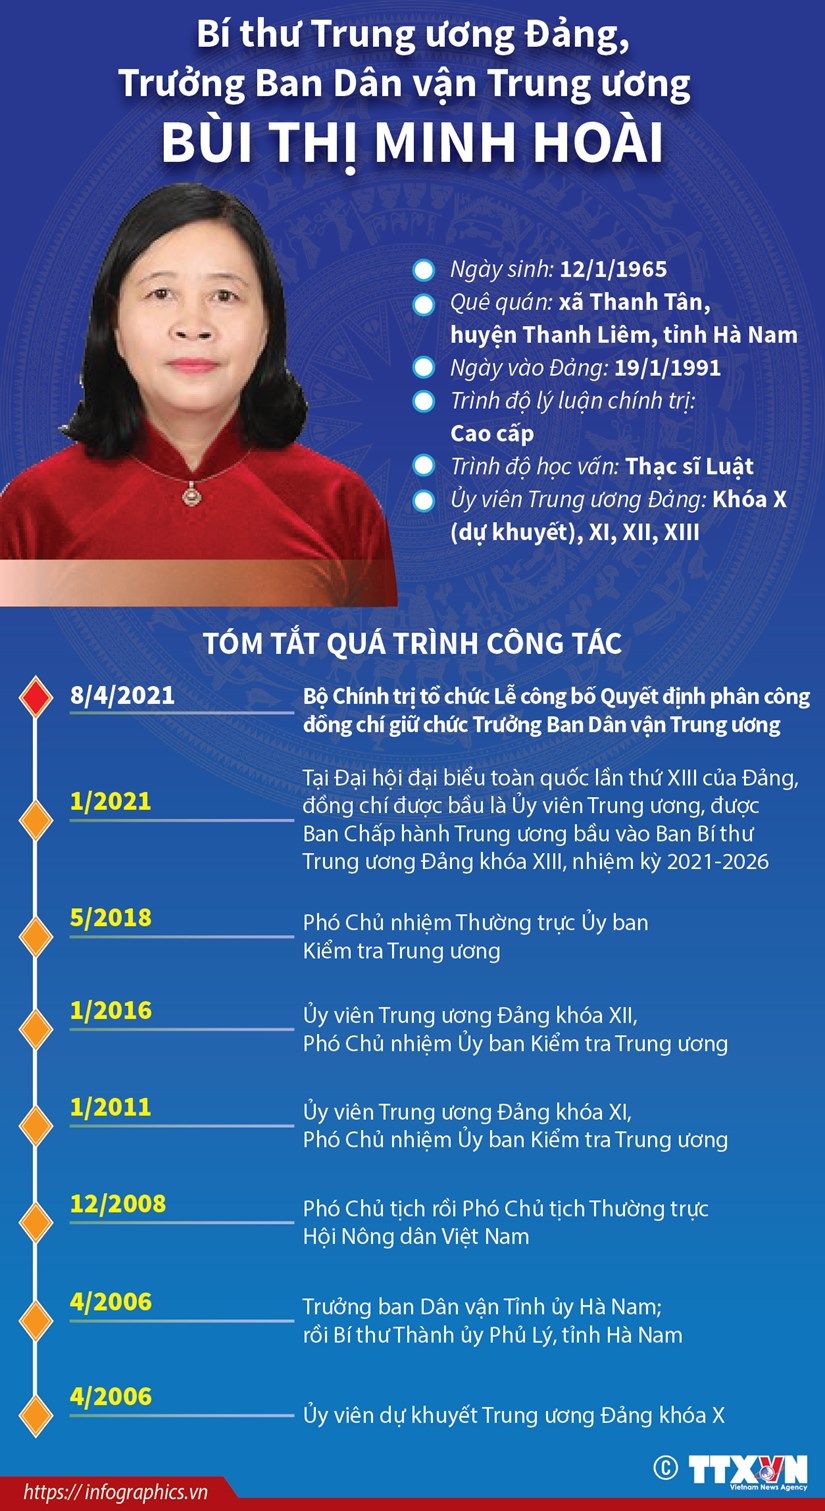 Bi thu TW Dang, Truong Ban Dan van Trung uong Bui Thi Minh Hoai hinh anh 1